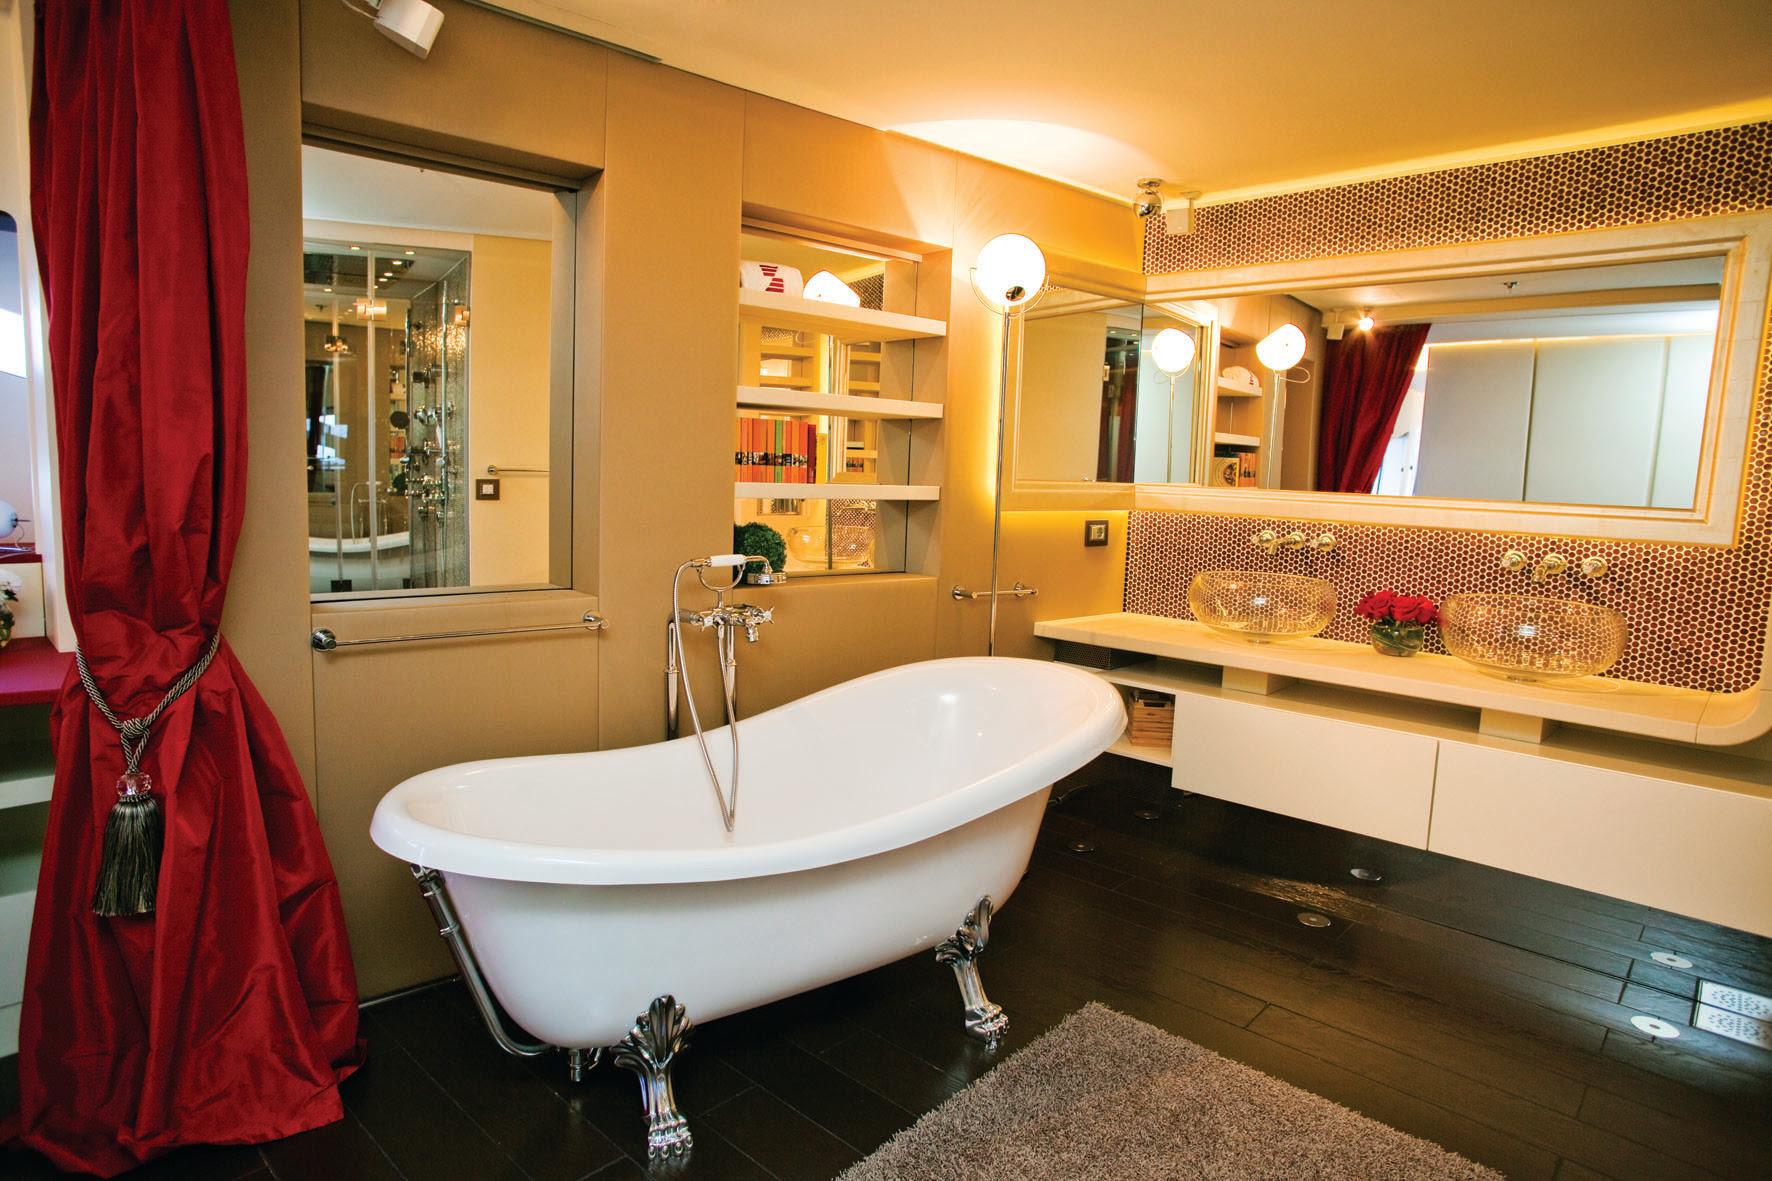 Superyacht JoyMe Master Bathroom - Interior design by Marijana